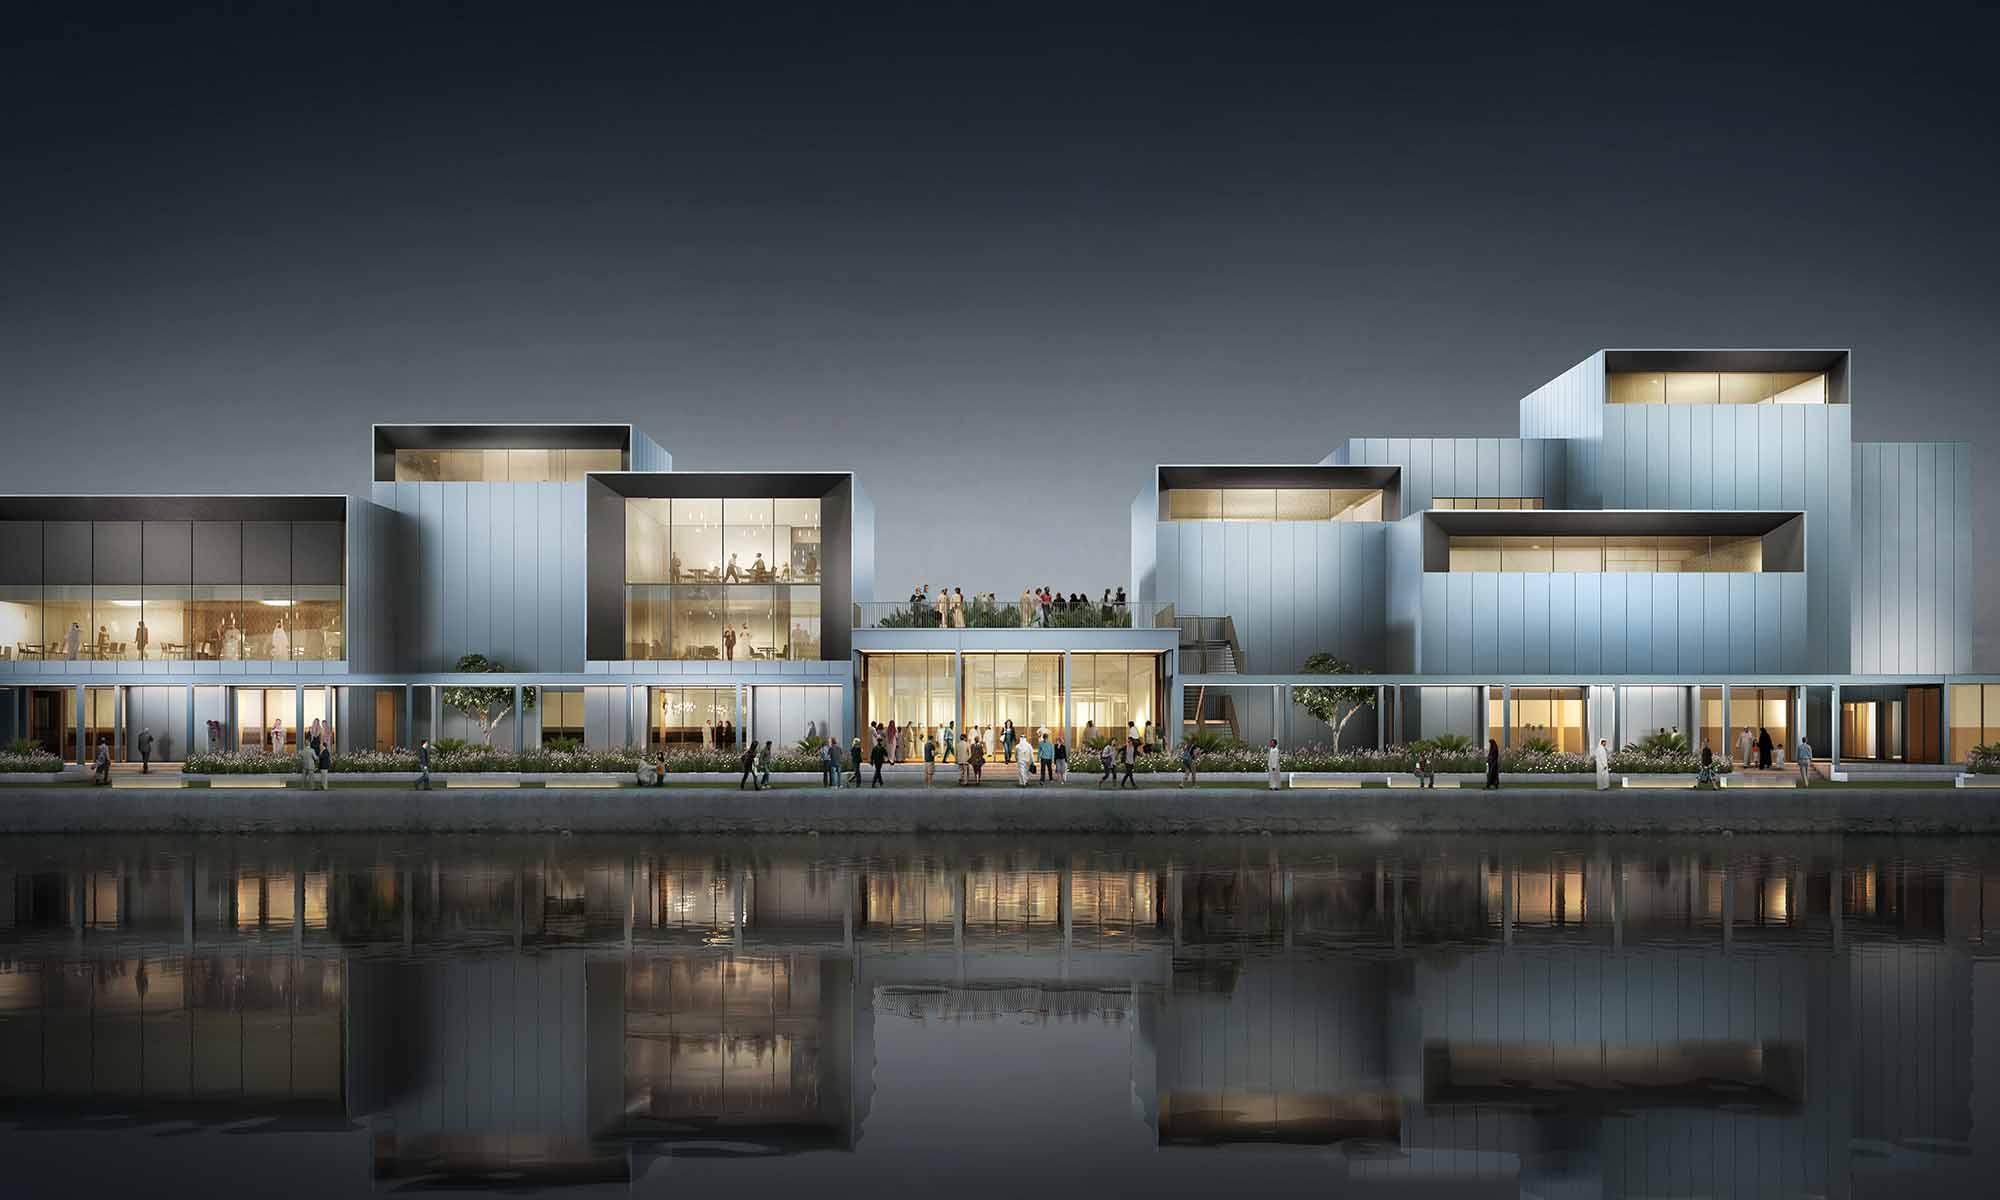 Dubai Culture Village, UAE: Jameel Arts Centre